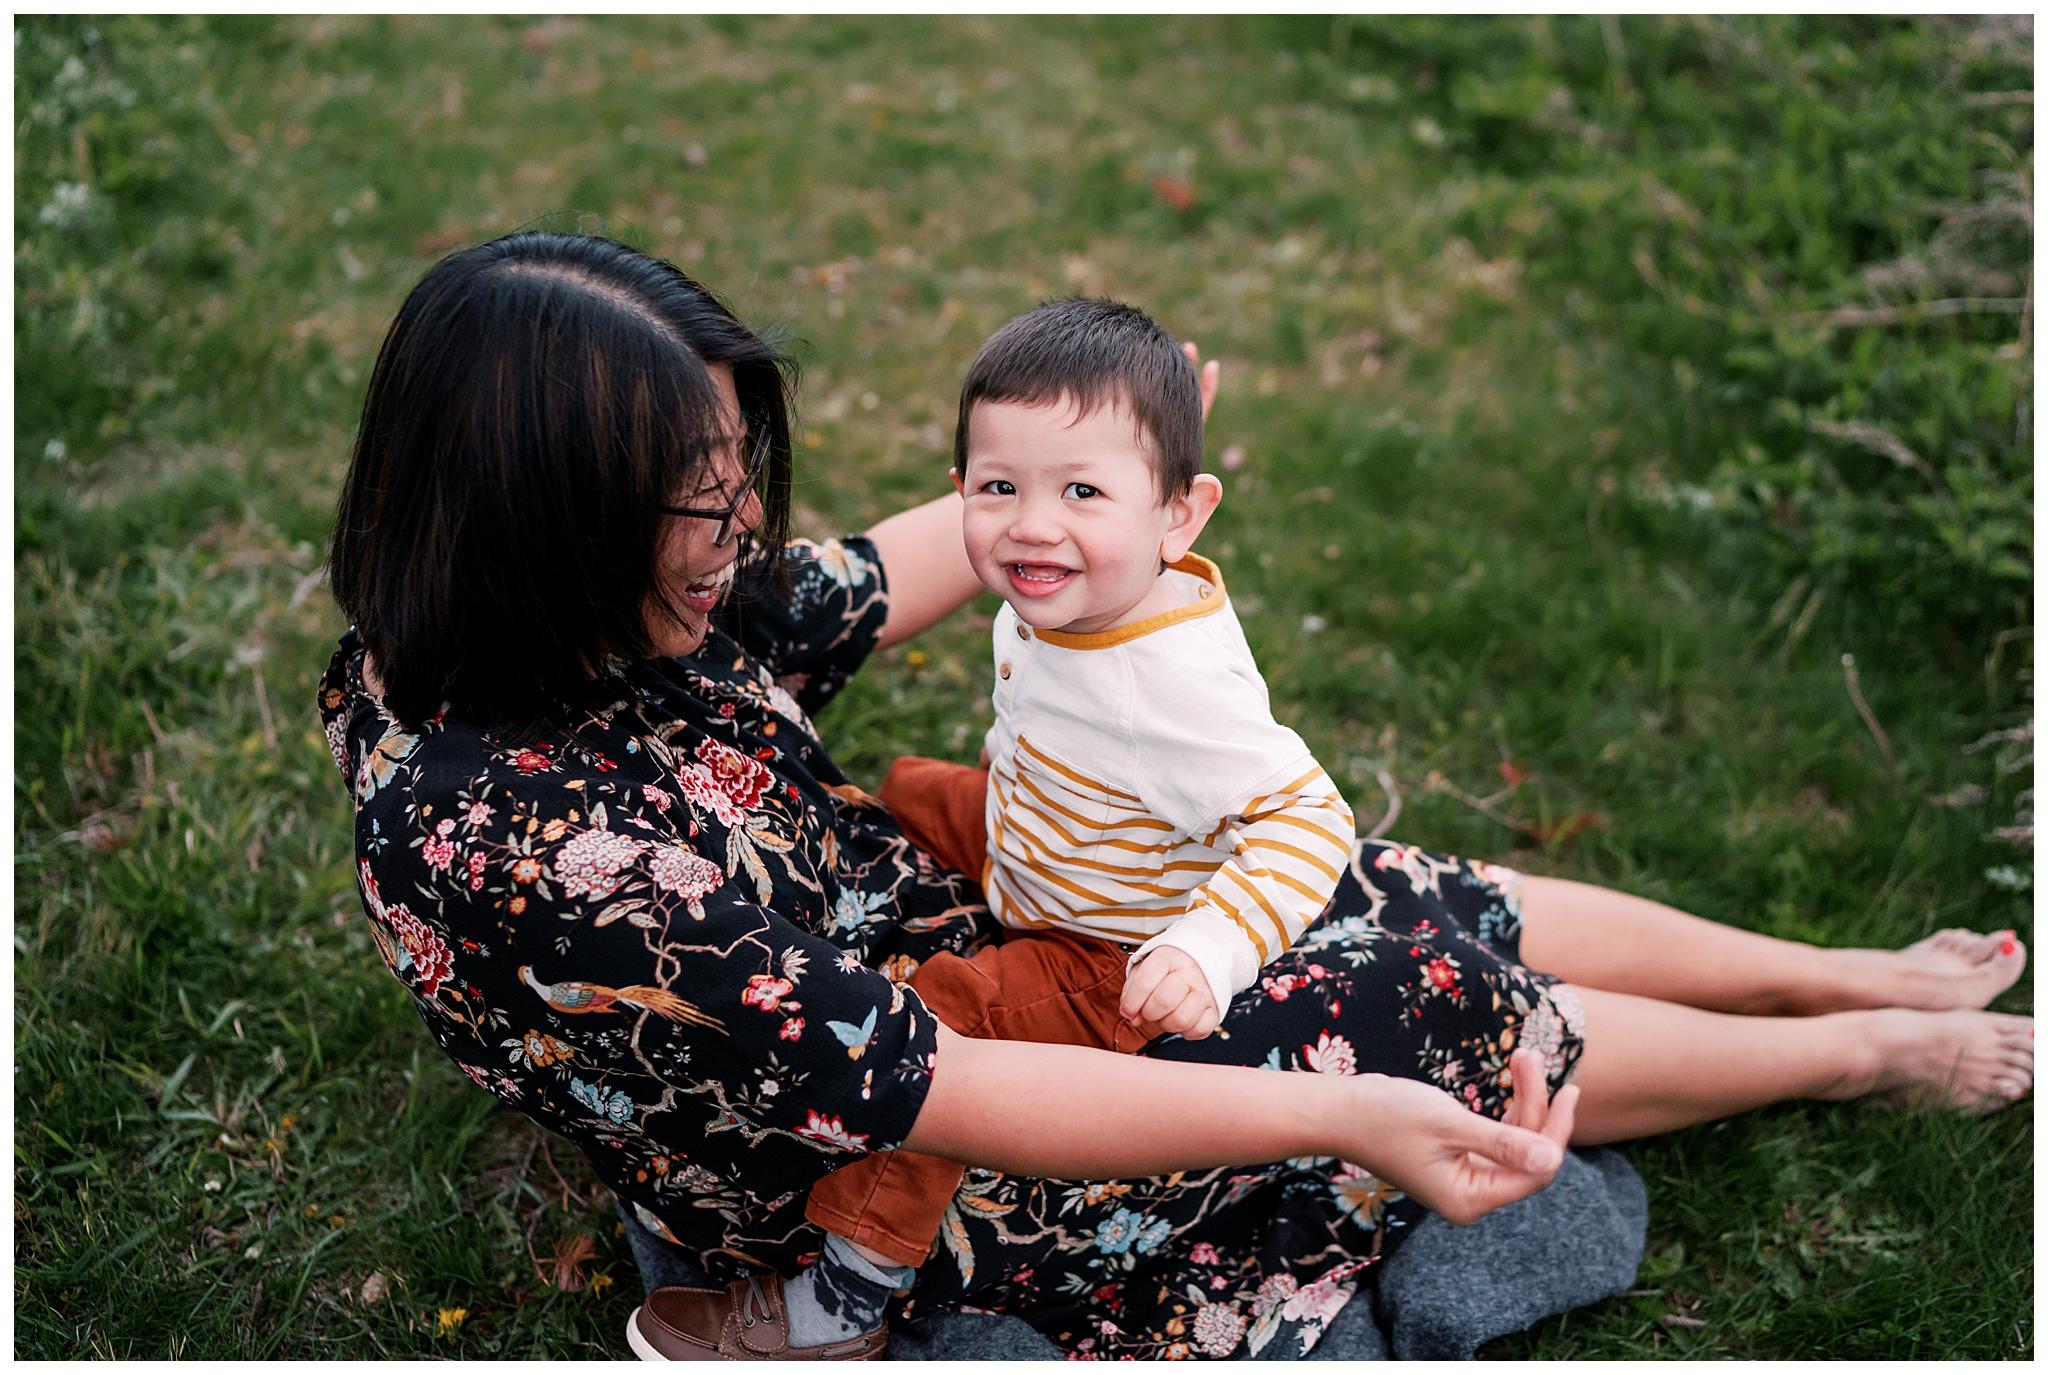 AnneMarie_Hamant_family_photographer_lehigh_valley_pa_0209.jpg